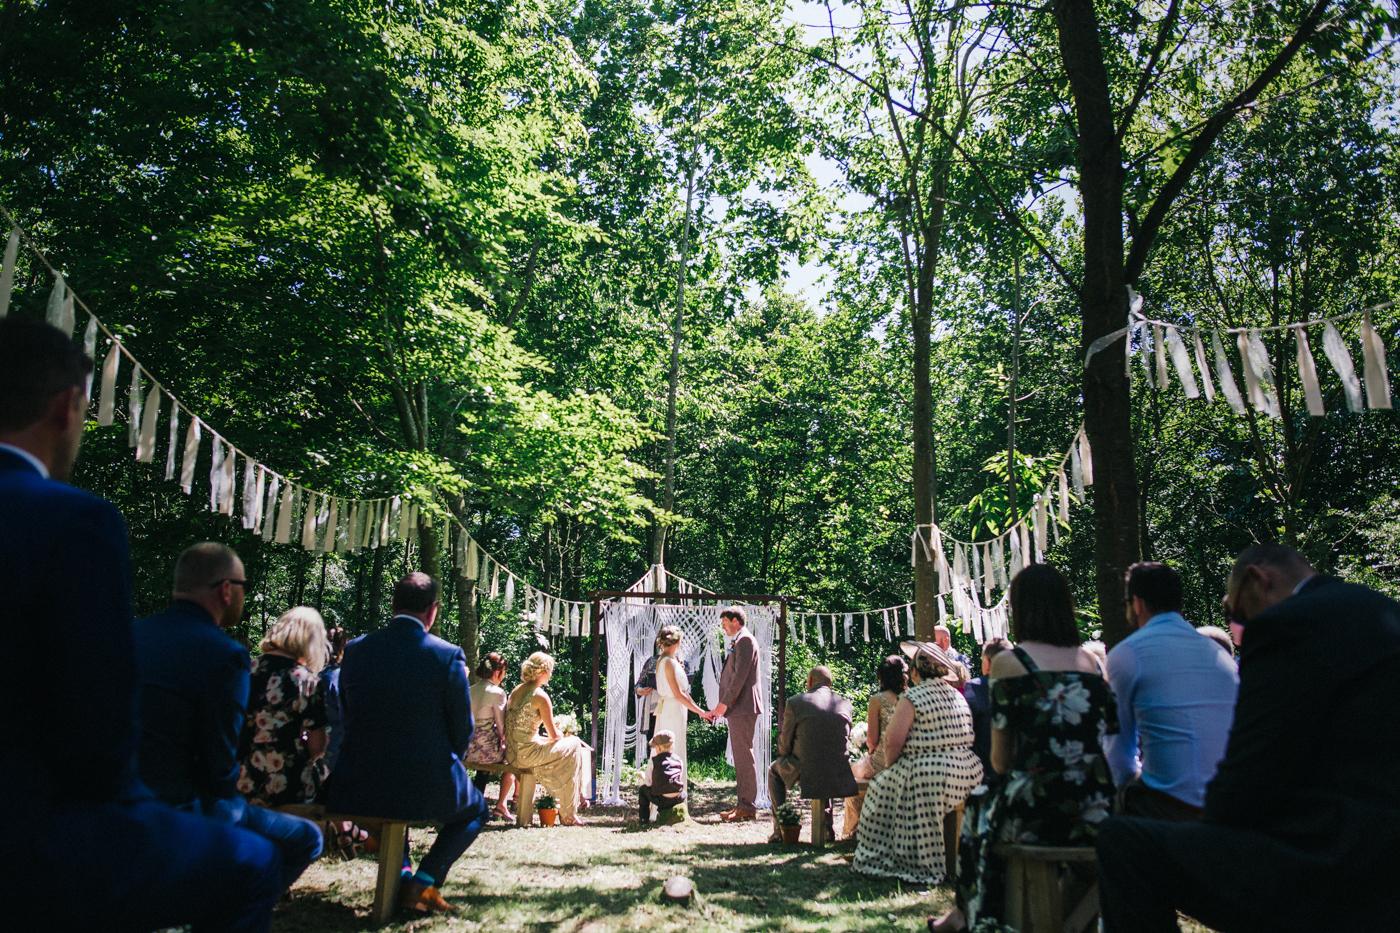 teesside-middlesbrough-north-east-wedding-photographer-creative-wedding-venues-0074.jpg